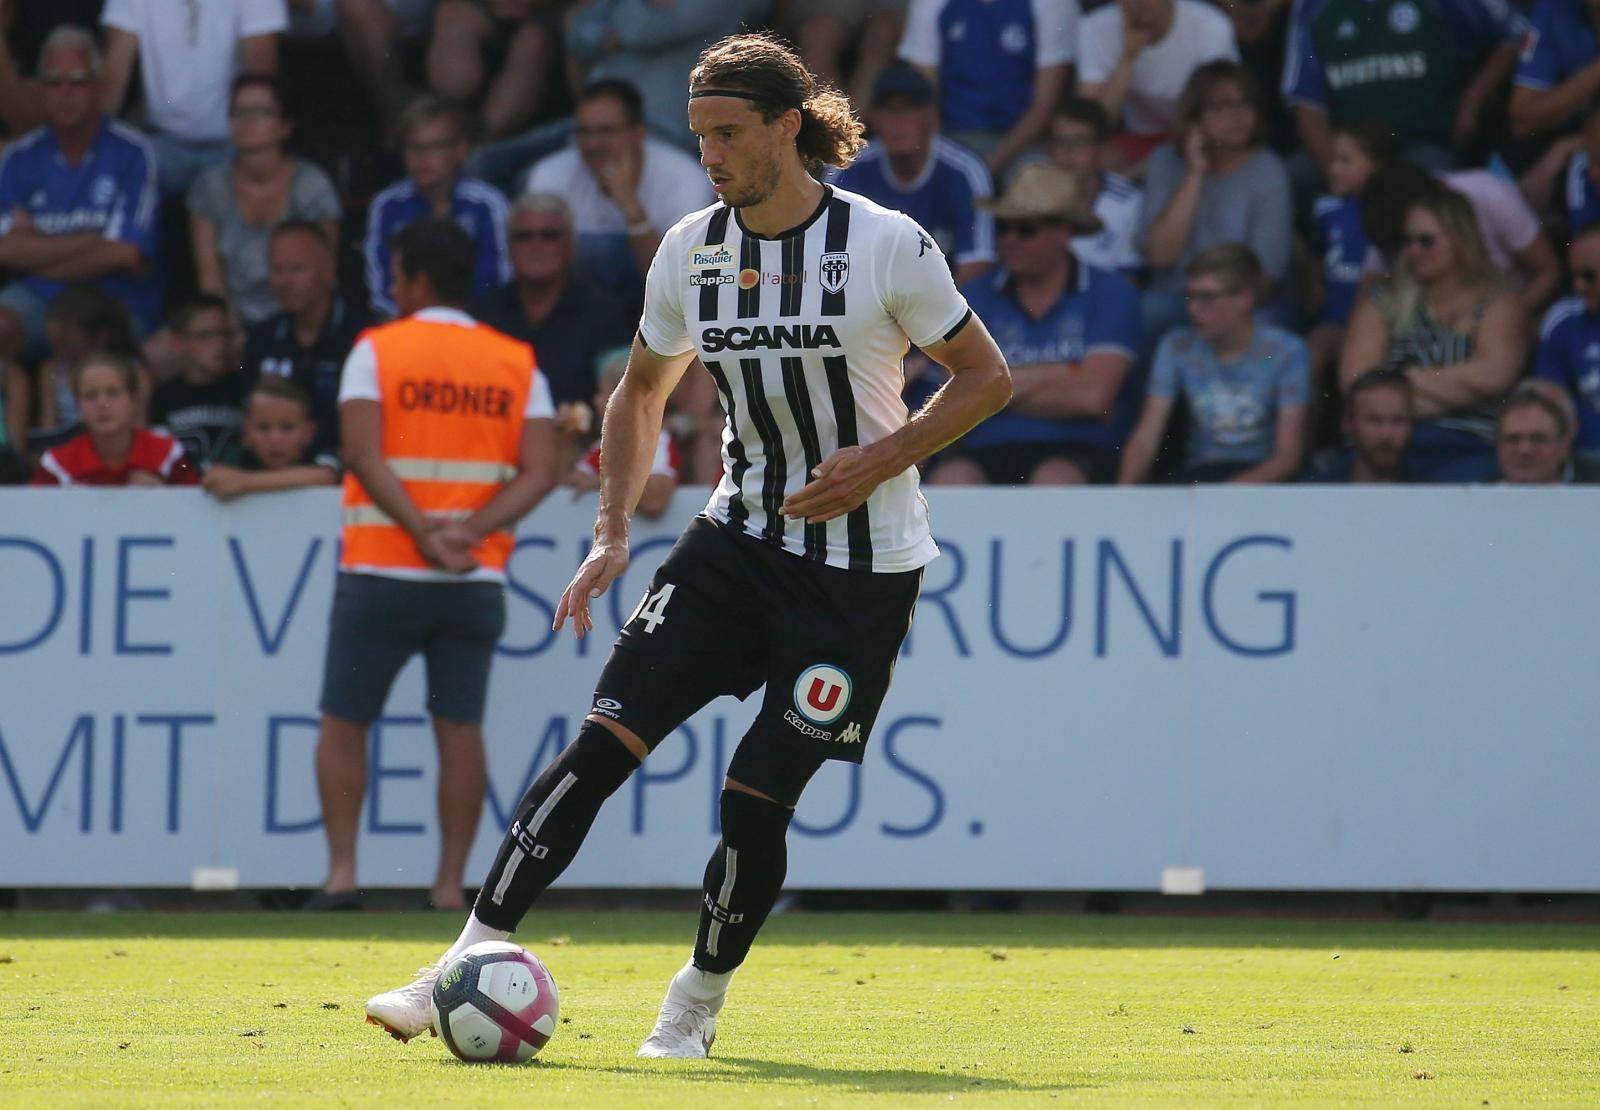 firo Football, Football, 05.08.2018 1st Bundesliga, season 2018/2019 Test match FC Schalke 04 - SCO Angers